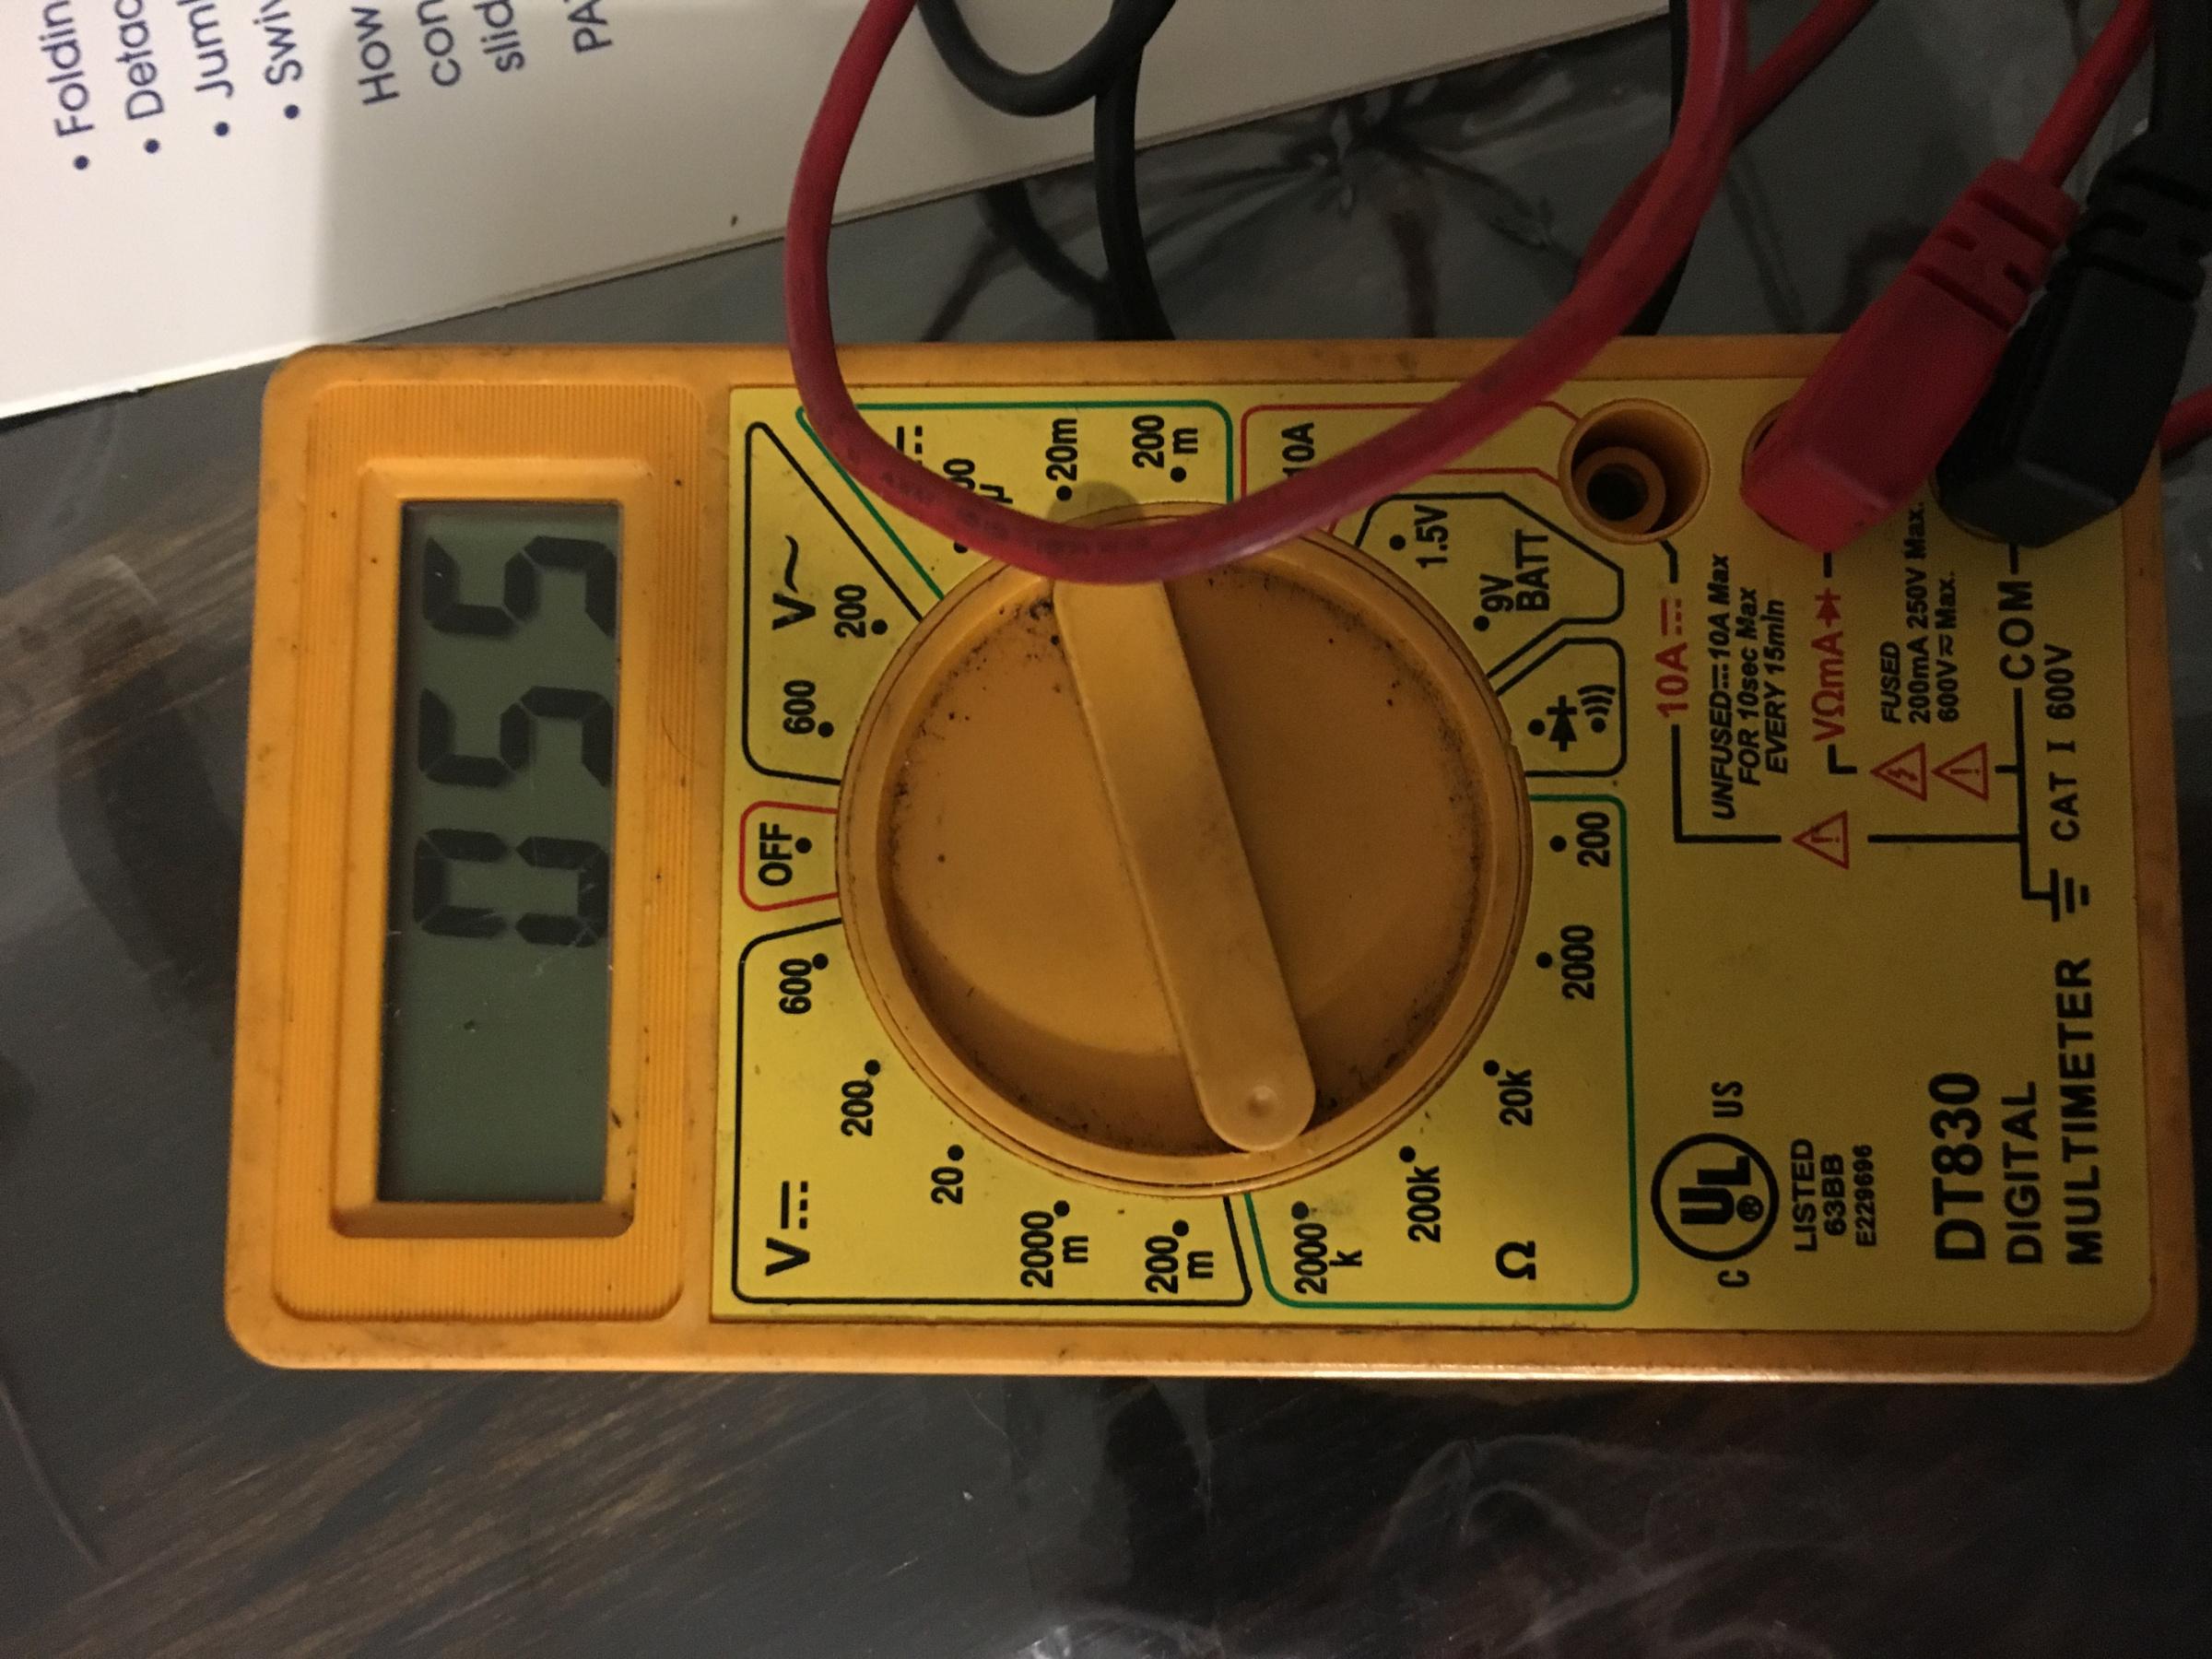 Wiring lights to a 2 prong plug-img_8294.jpg